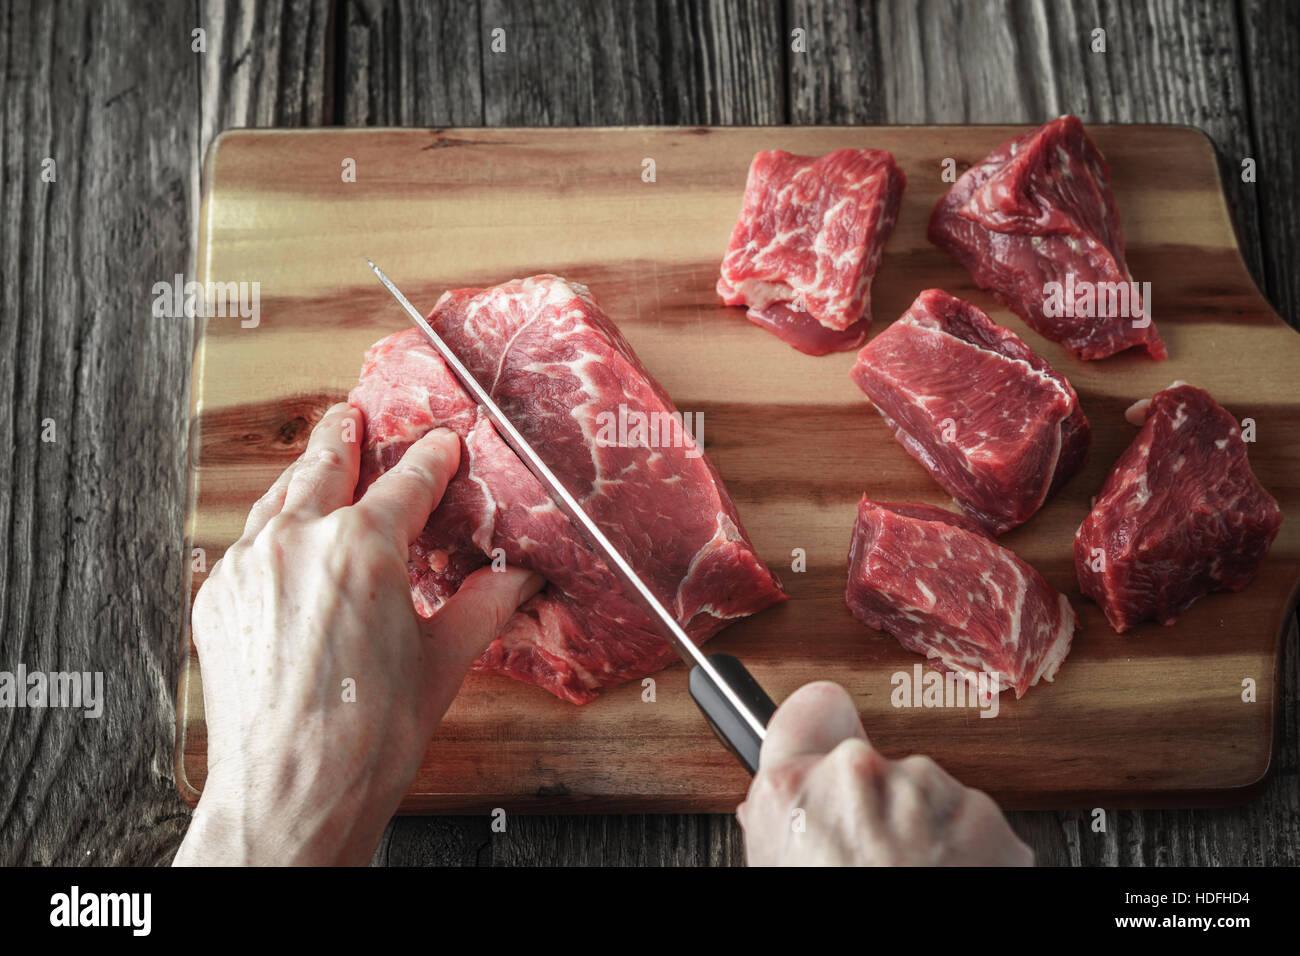 Cortar carne Angus en la madera de la mesa horizontal Imagen De Stock